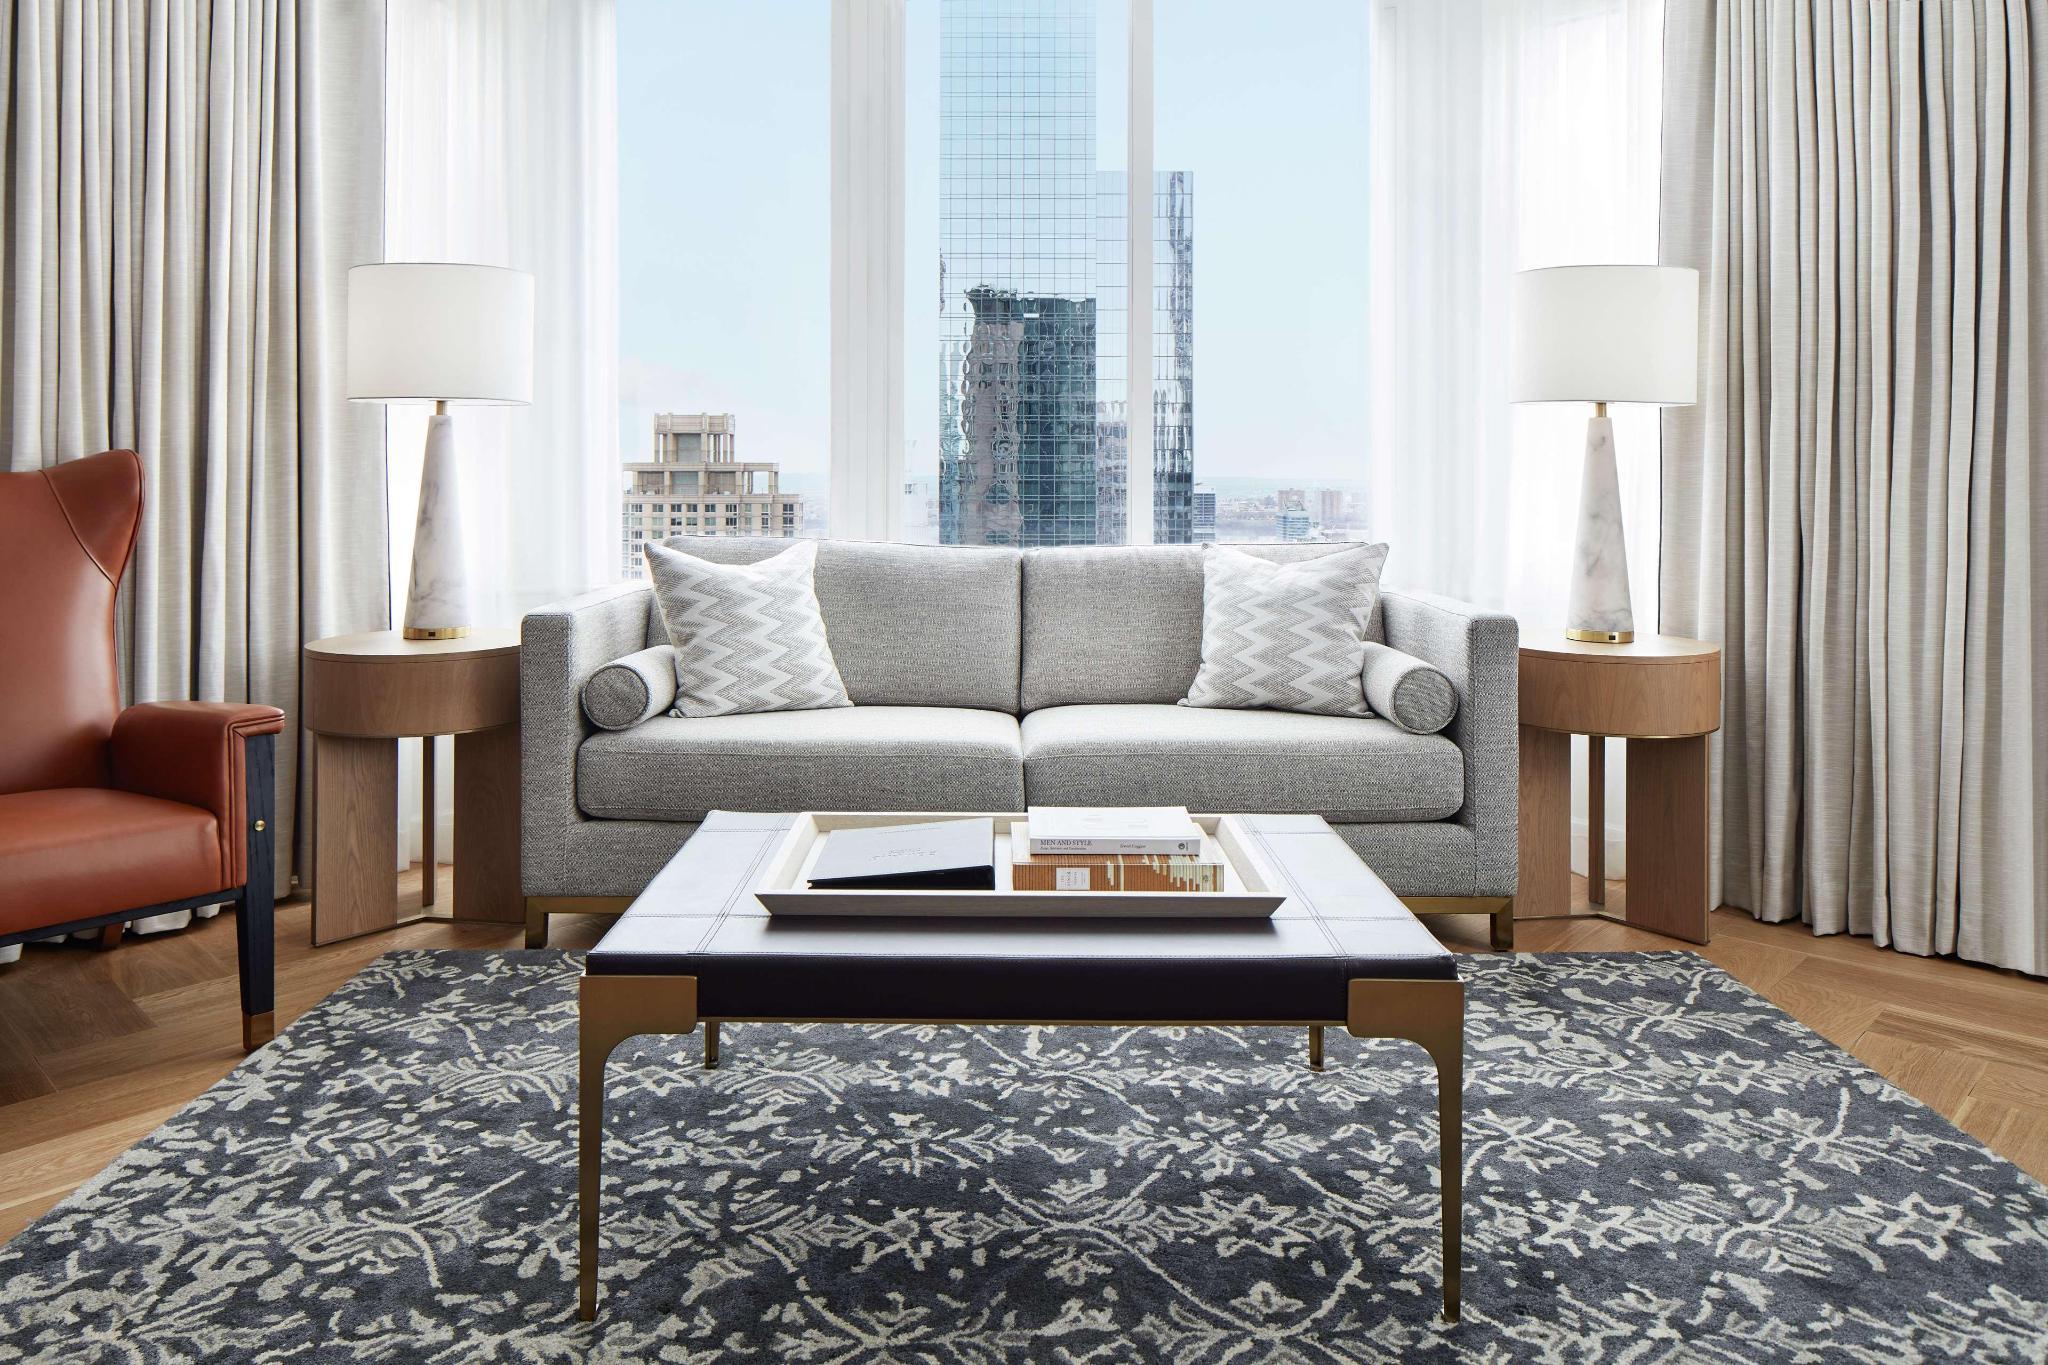 Park View Premium 1 Bedroom Suite - 1 King